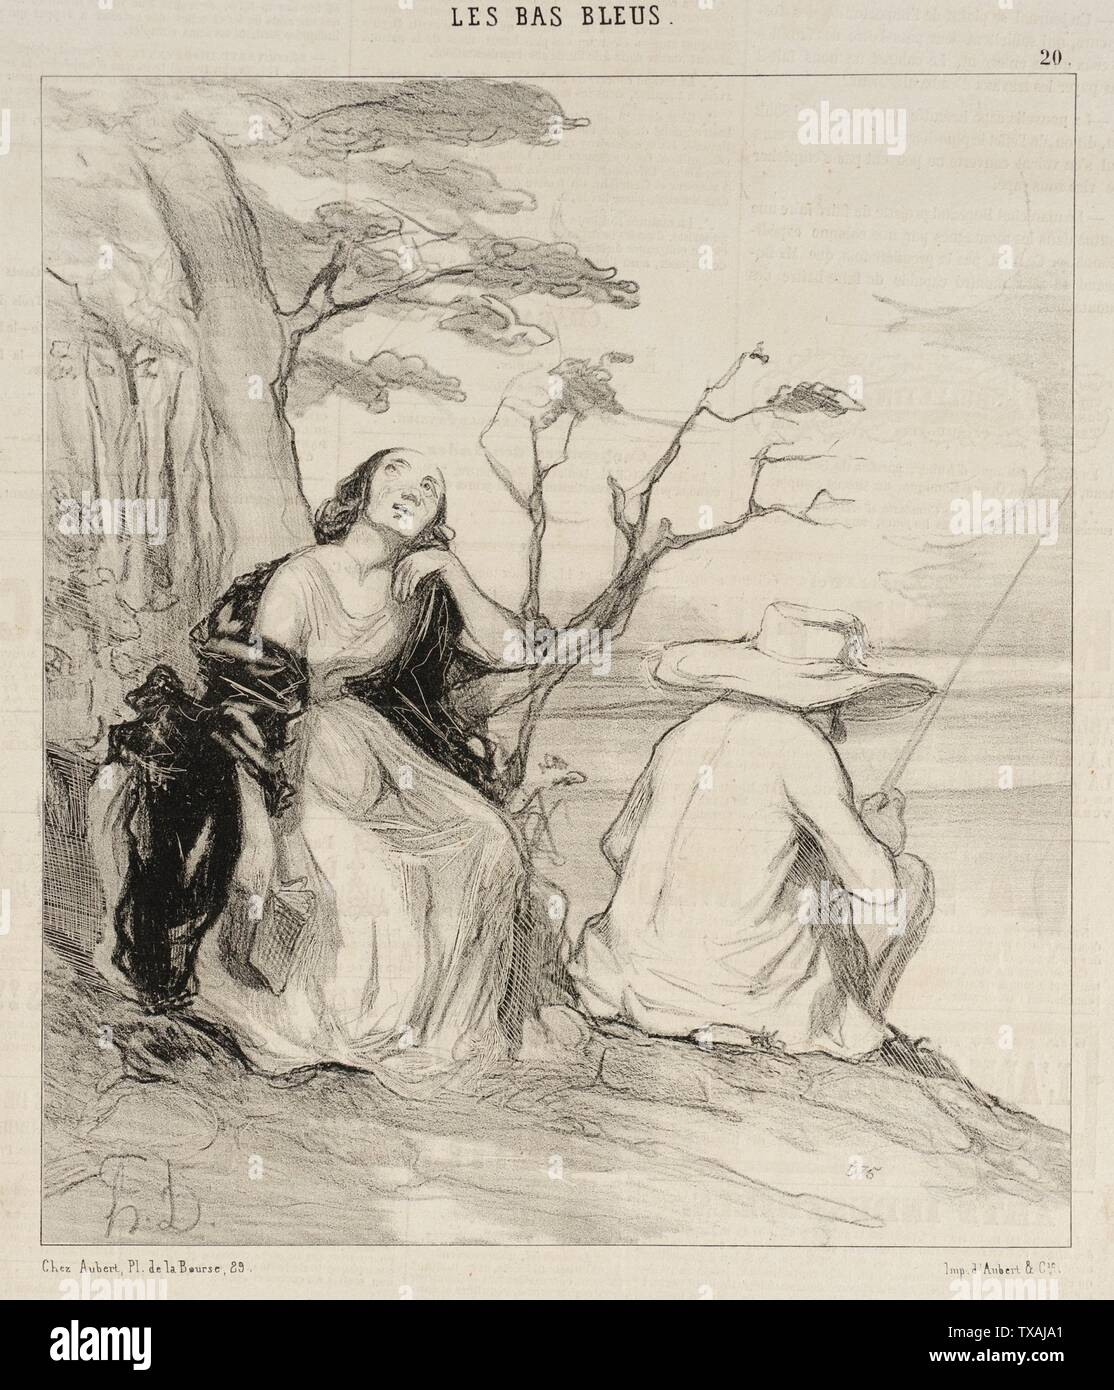 'O douleur!...avoir rêvé...un époux...; English:  France, 1844 Series: Les Bas-blues, no. 20 Periodical: Le Charivari, 27 March 1844 Prints; lithographs Lithograph Sheet: 9 7/8 x 7 15/16 in. (25.08 x 20.16 cm) Gift of Mrs. Florence Victor from The David and Florence Victor Collection (M.91.82.178) Prints and Drawings; 1844date QS:P571,+1844-00-00T00:00:00Z/9; ' - Stock Image